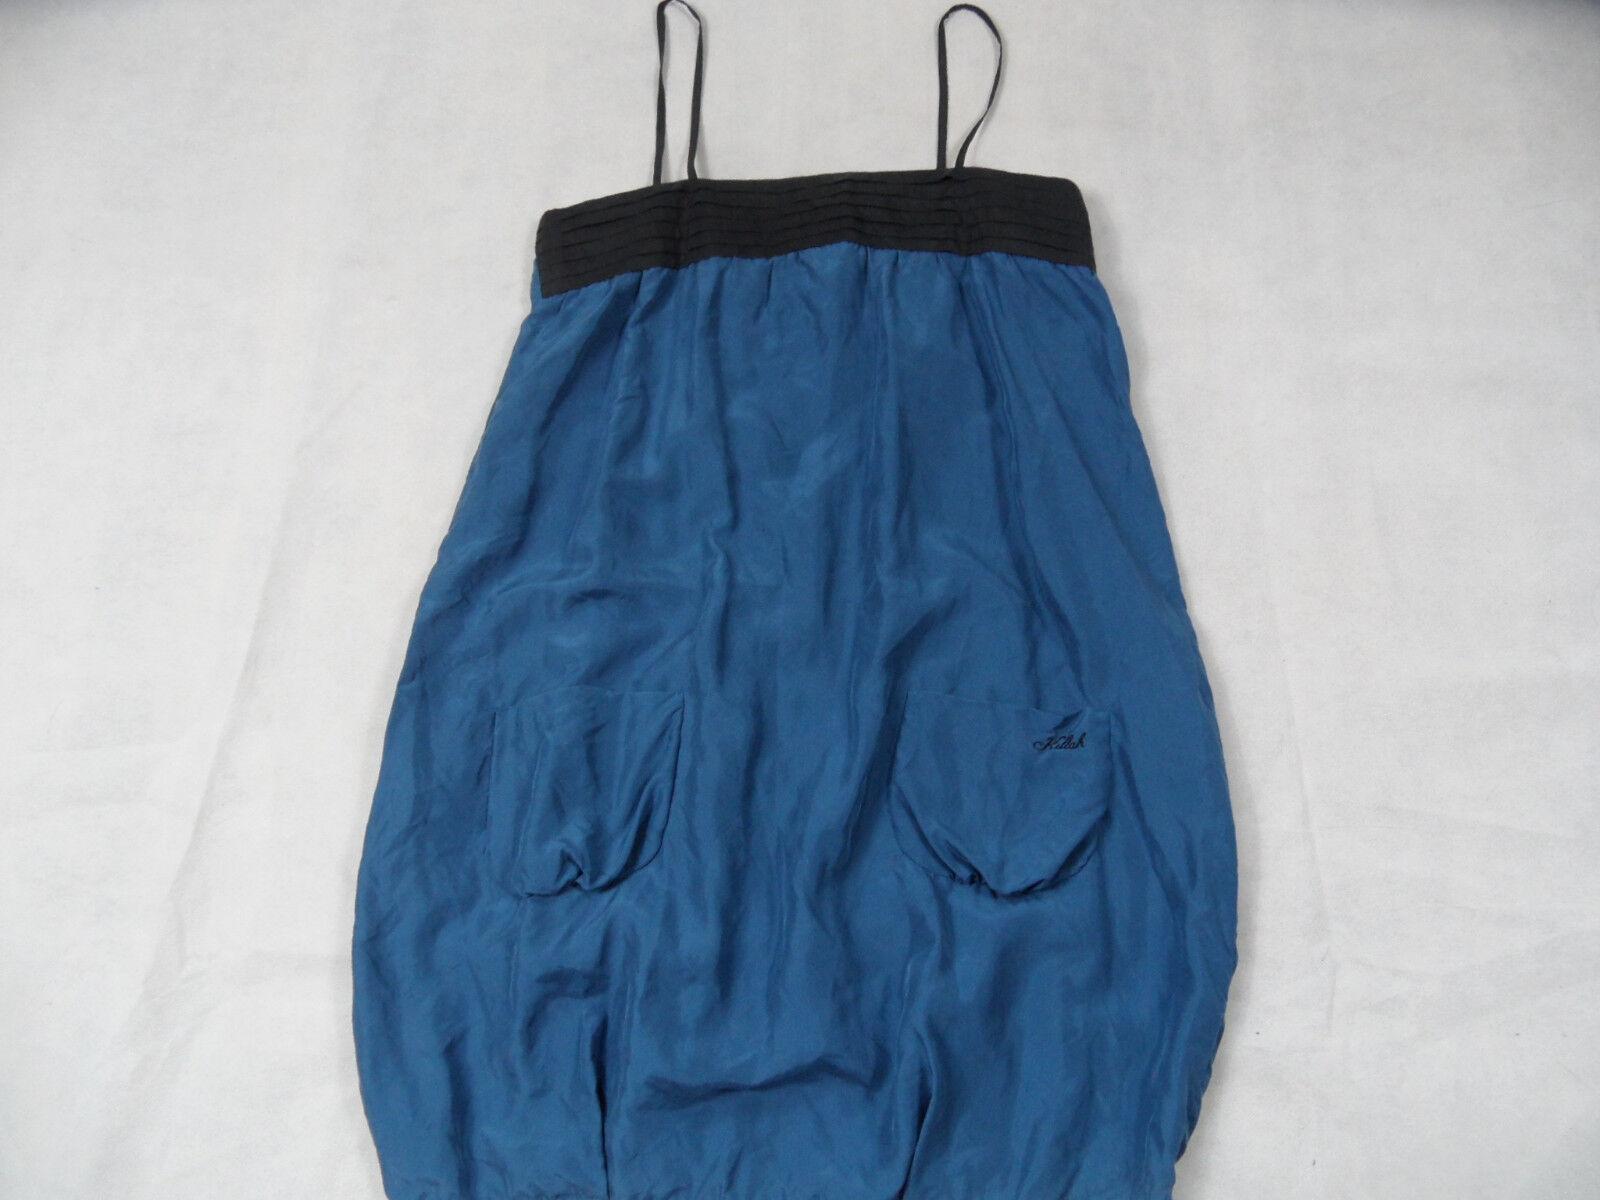 KILLAH stylisches Hängerchen Ballonkleid Seide blue black Gr. L TOP ZC918